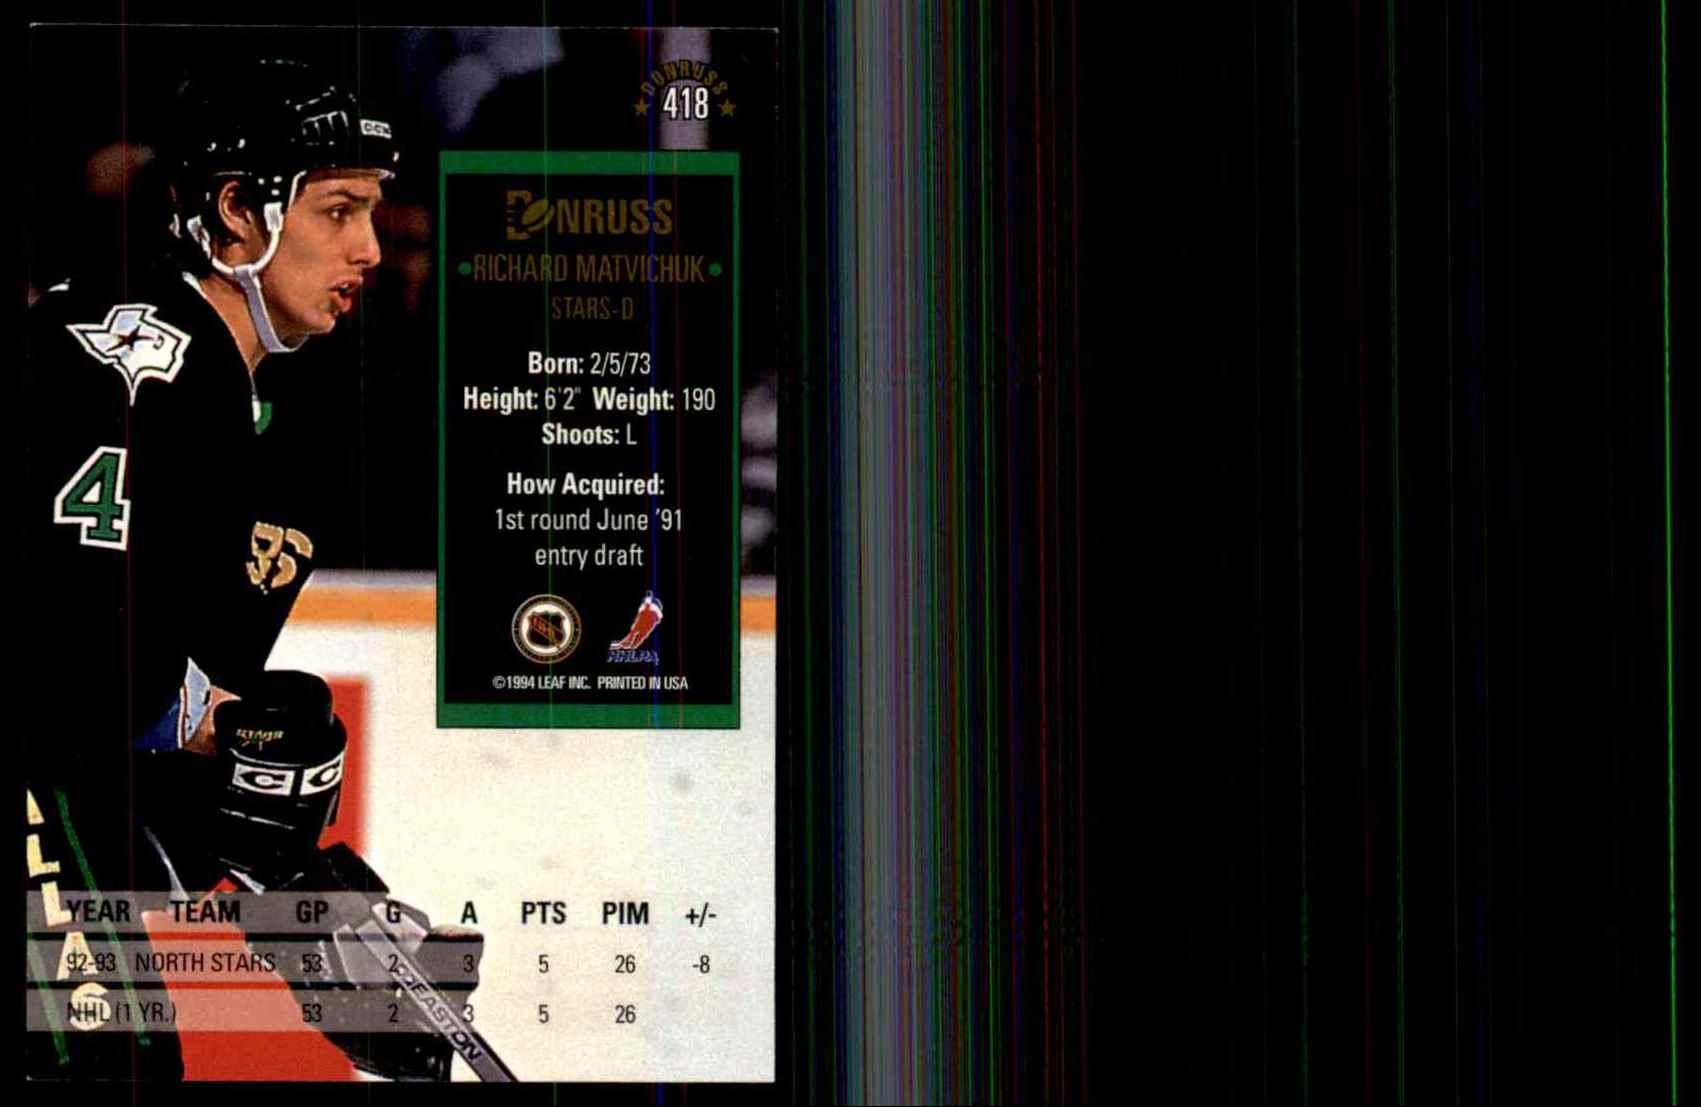 1993-94 Donruss Richard Matvichuk #418 card back image